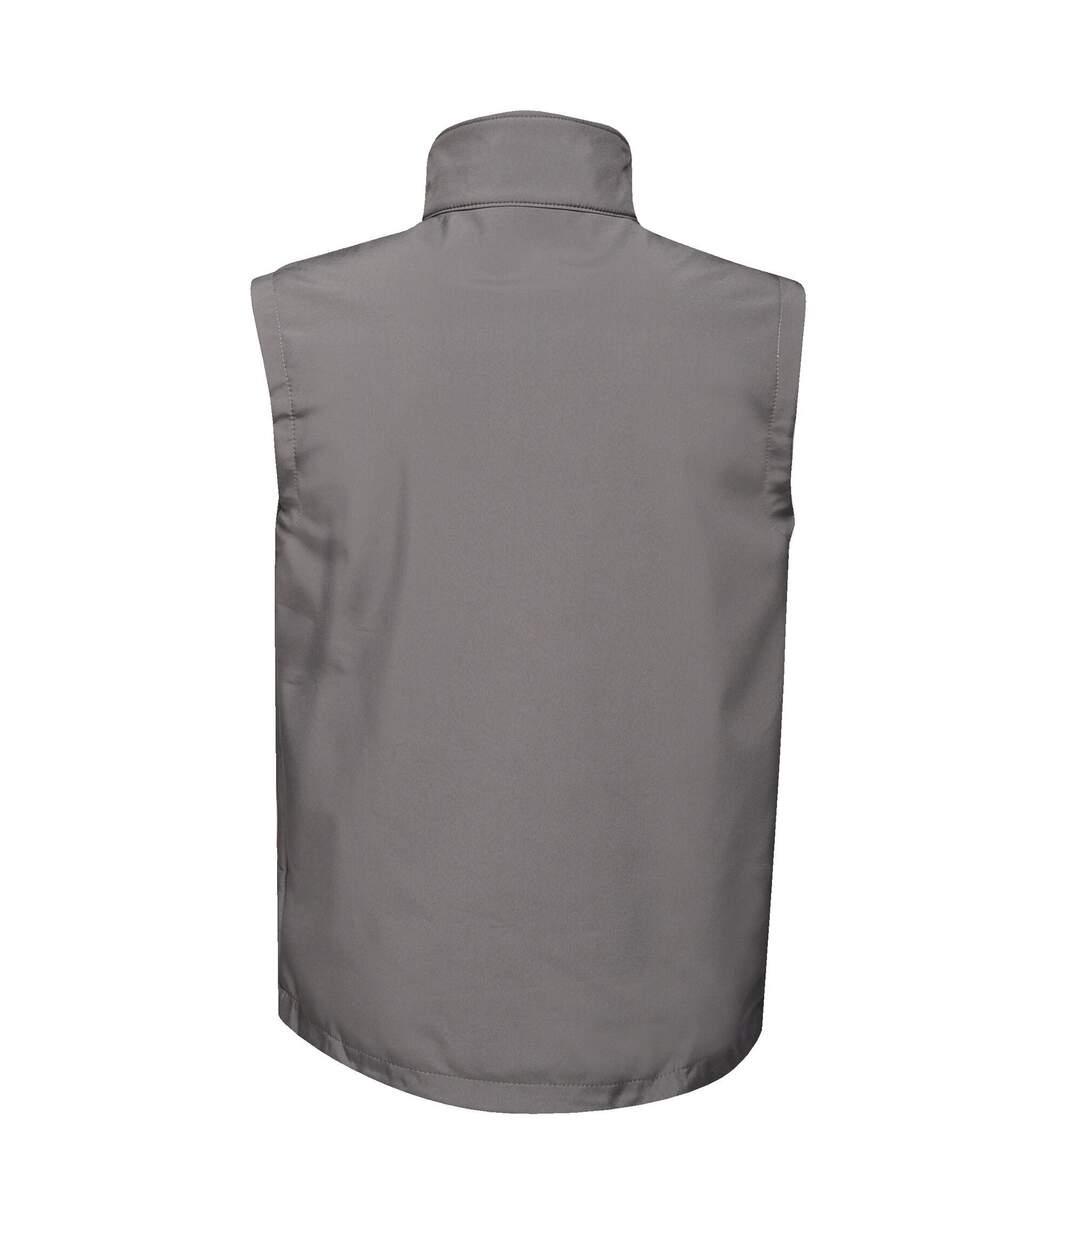 Regatta - Veste Softshell Sans Manches Octagon - Homme (Gris) - UTRG3565